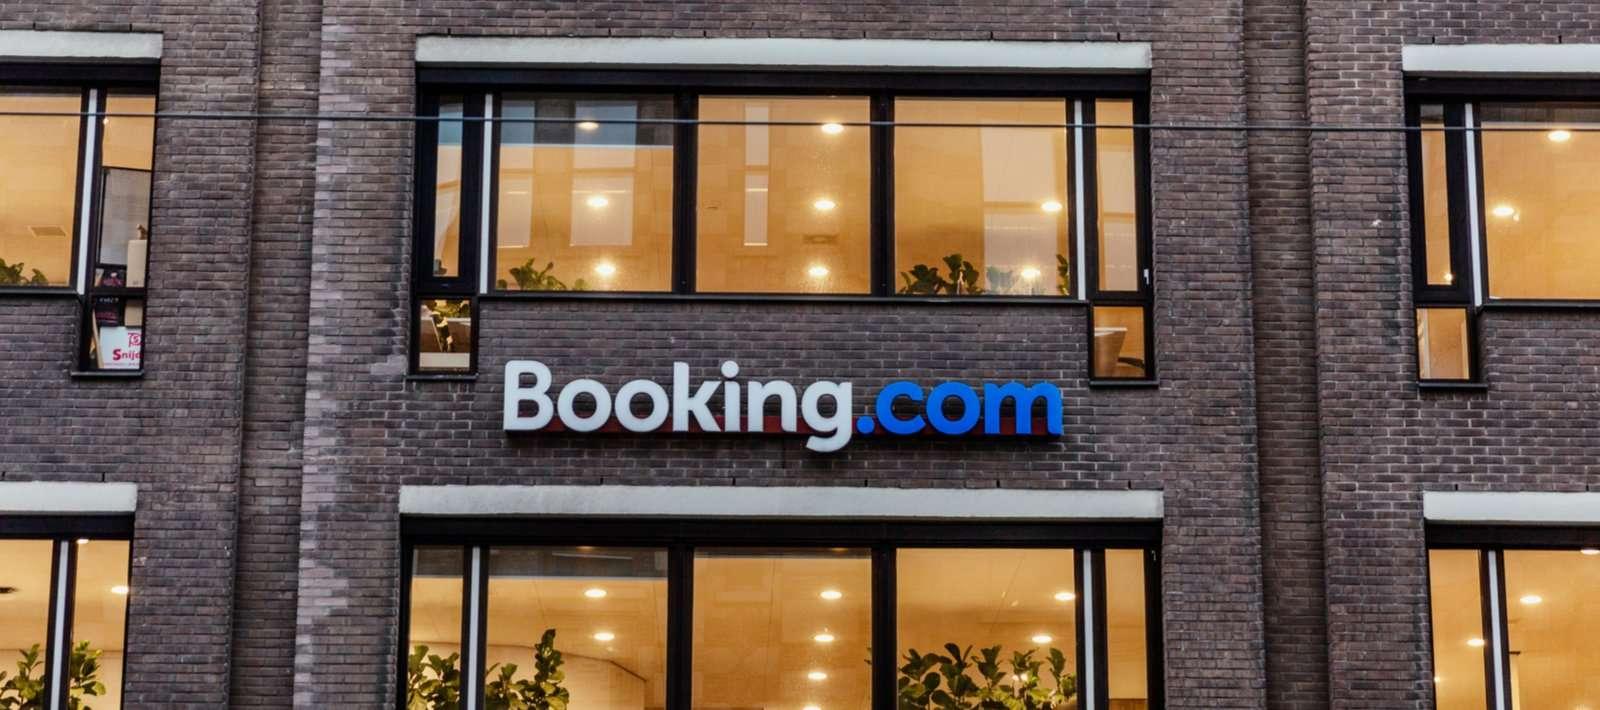 Booking.com Partnership and Affiliate Programs